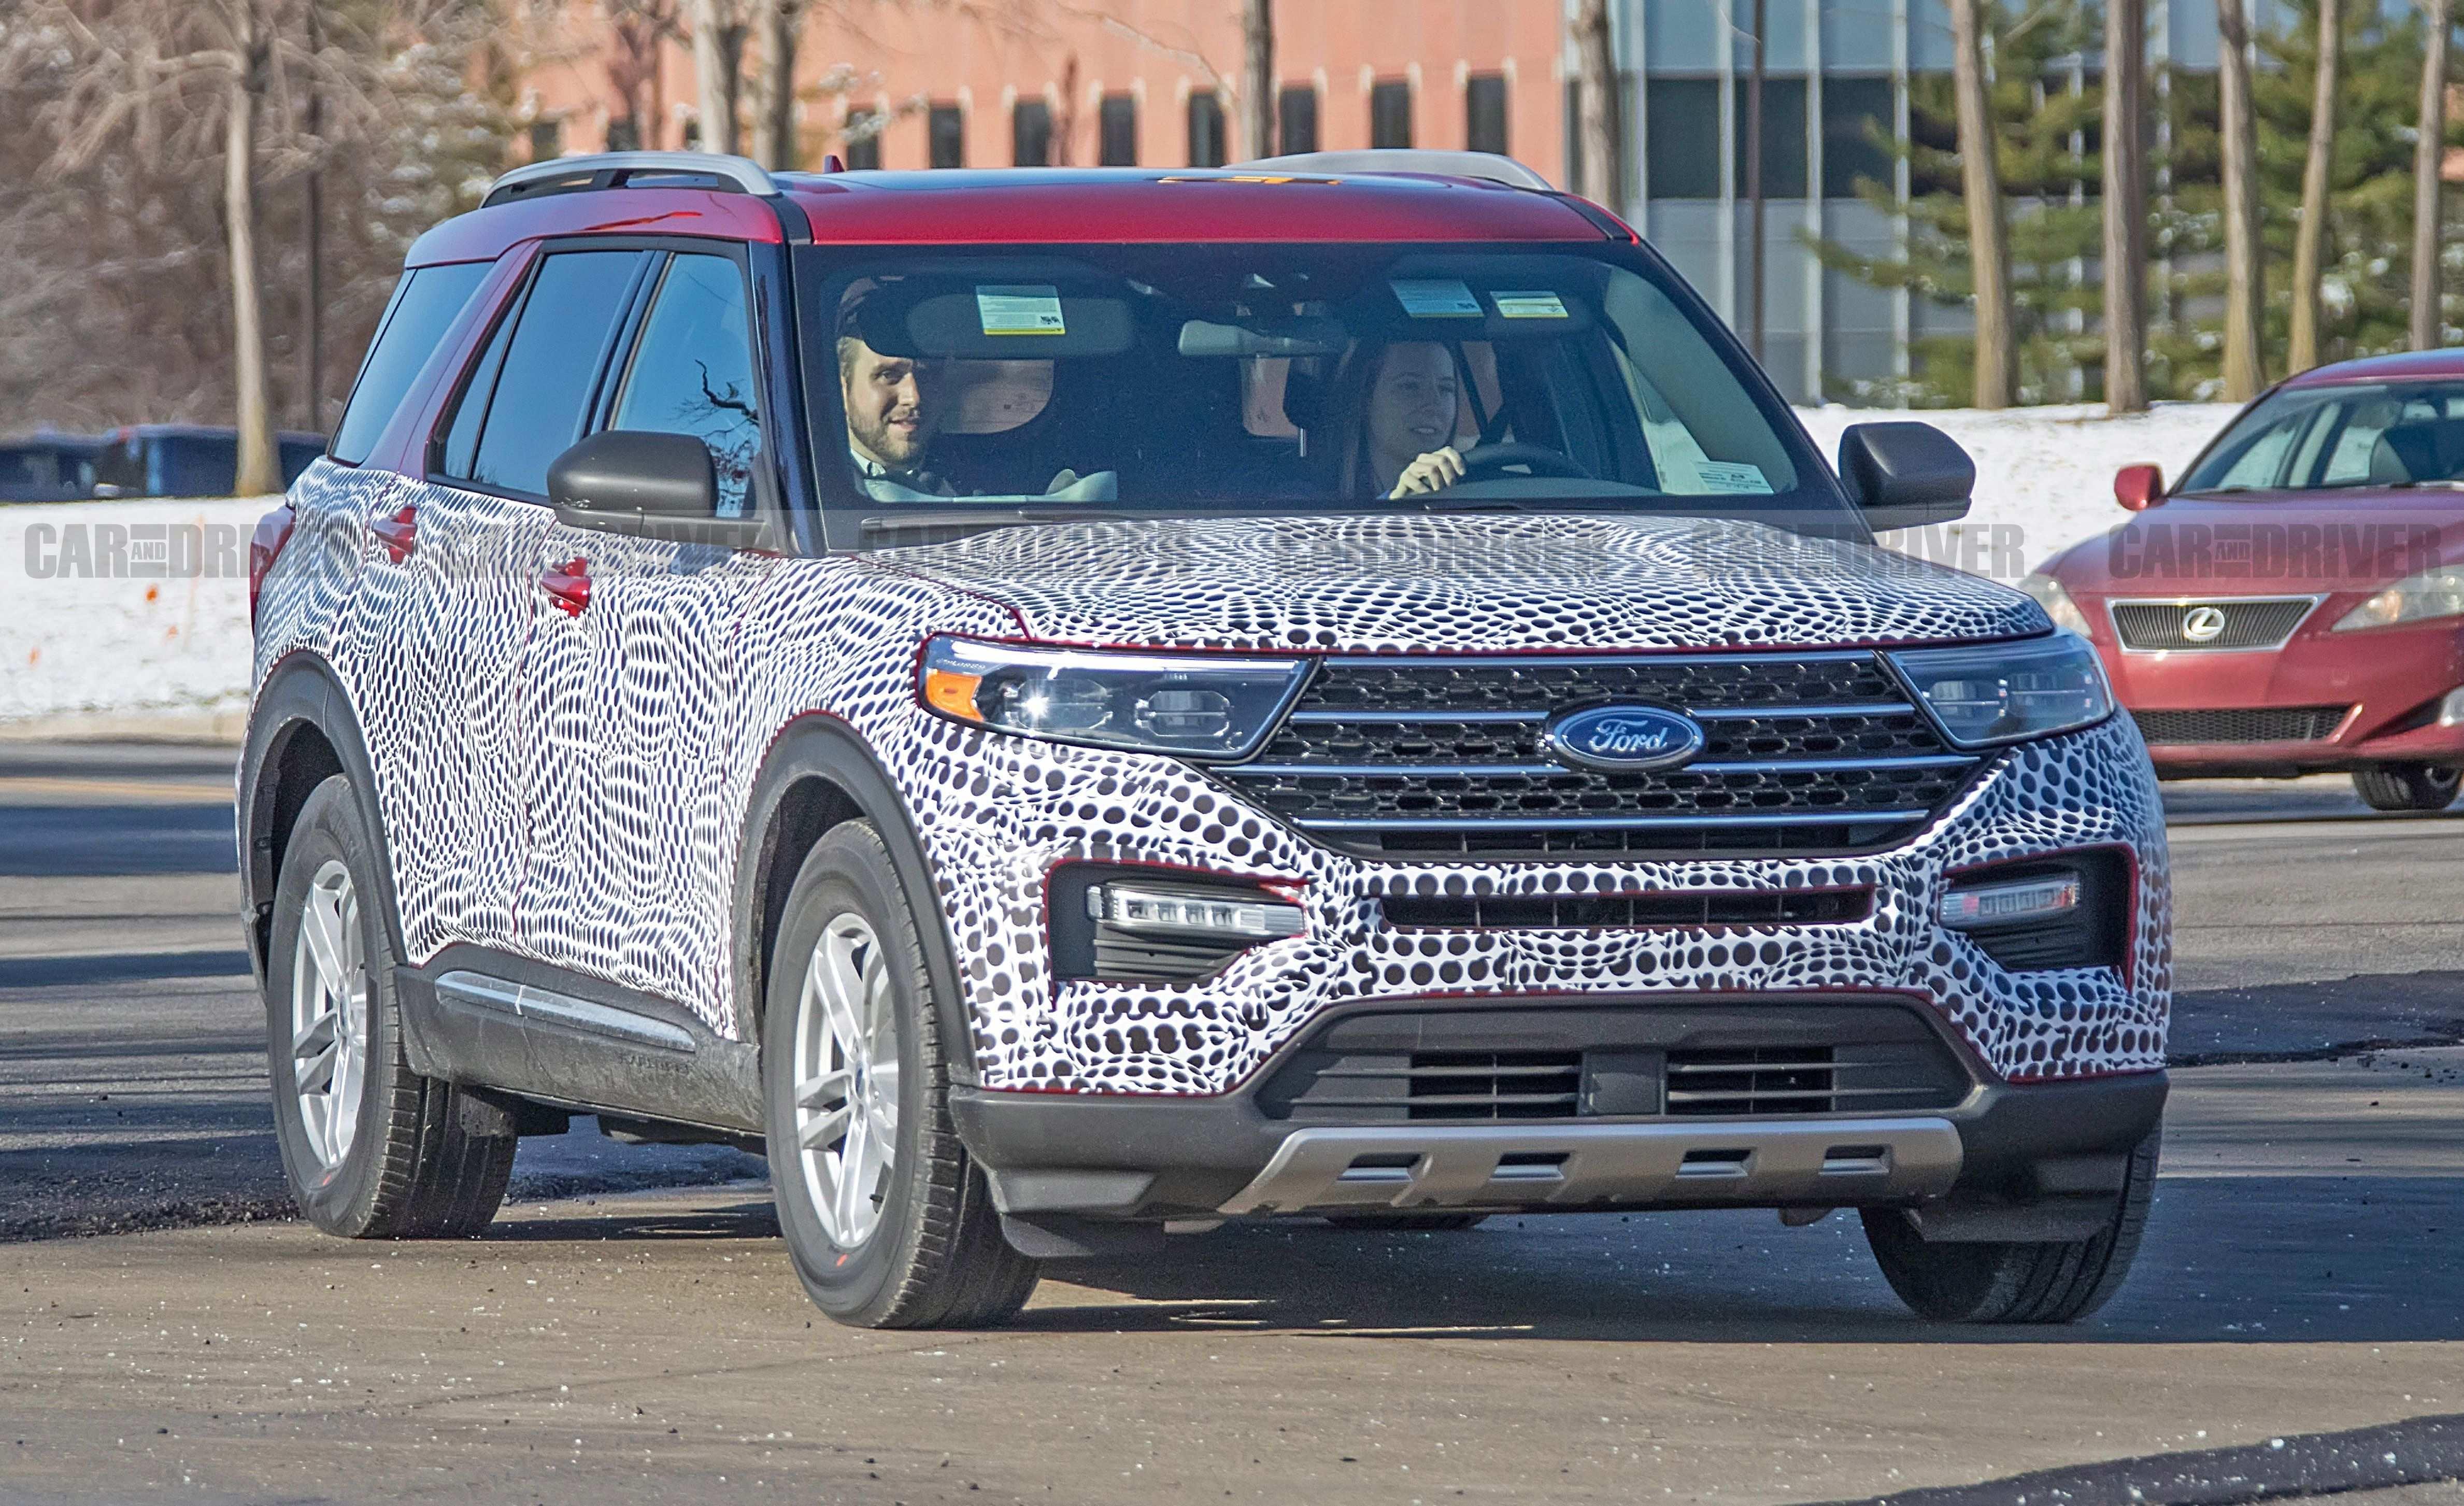 15 Best Review 2020 Ford Explorer Design Specs by 2020 Ford Explorer Design